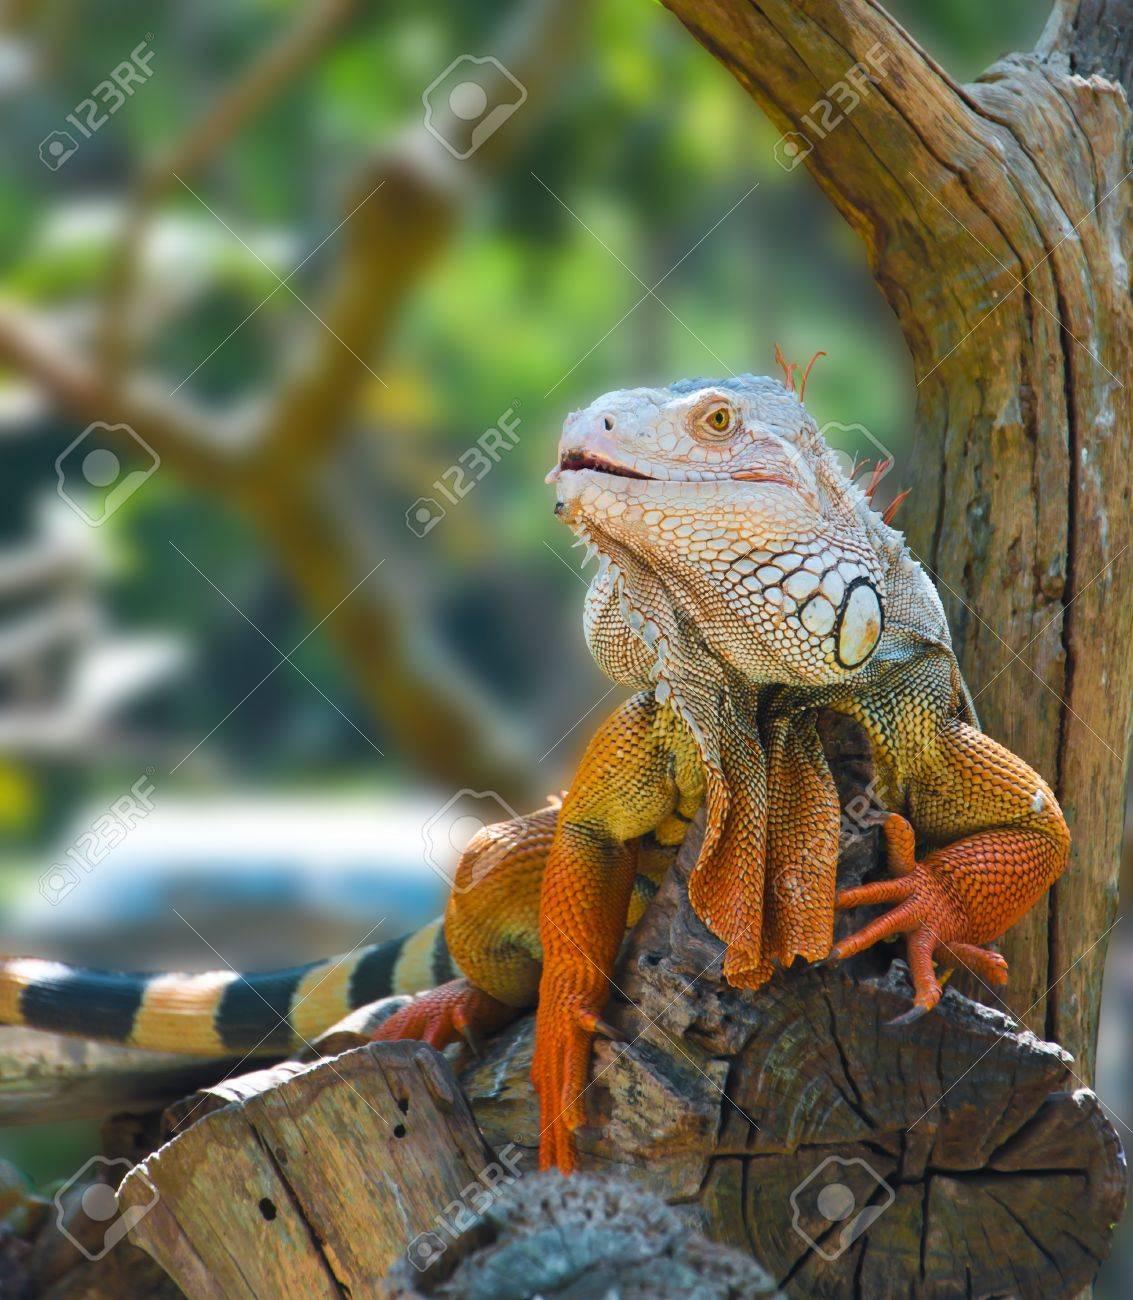 Iguana in the zoo - 11297924